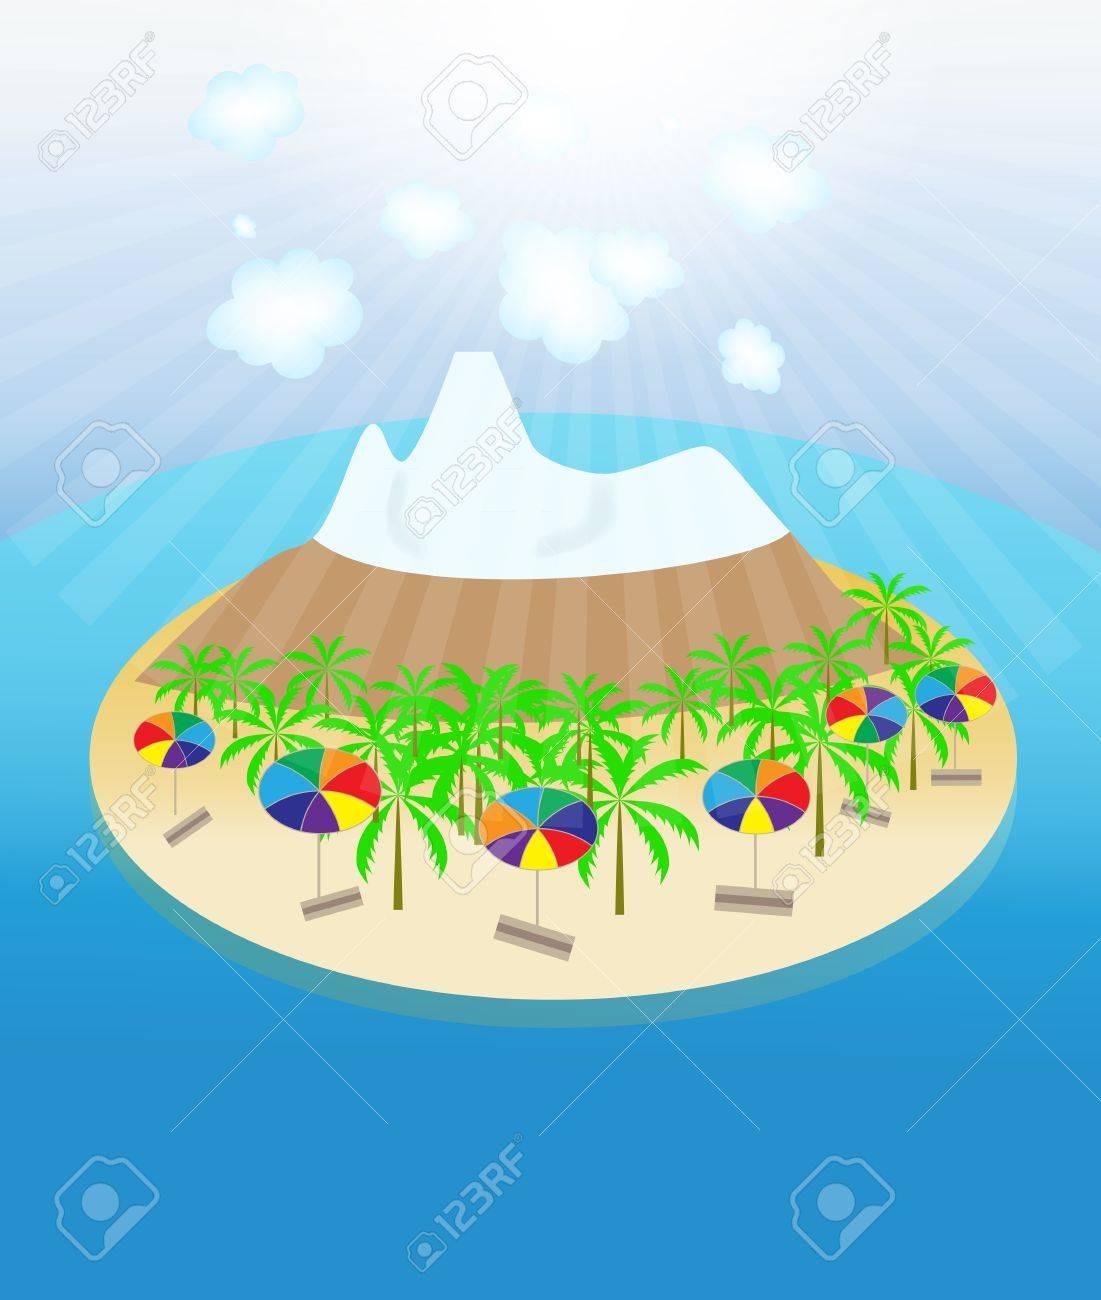 Island, palm trees, sun, umbrellas seamless pattern  Vector illu Stock Vector - 16732060